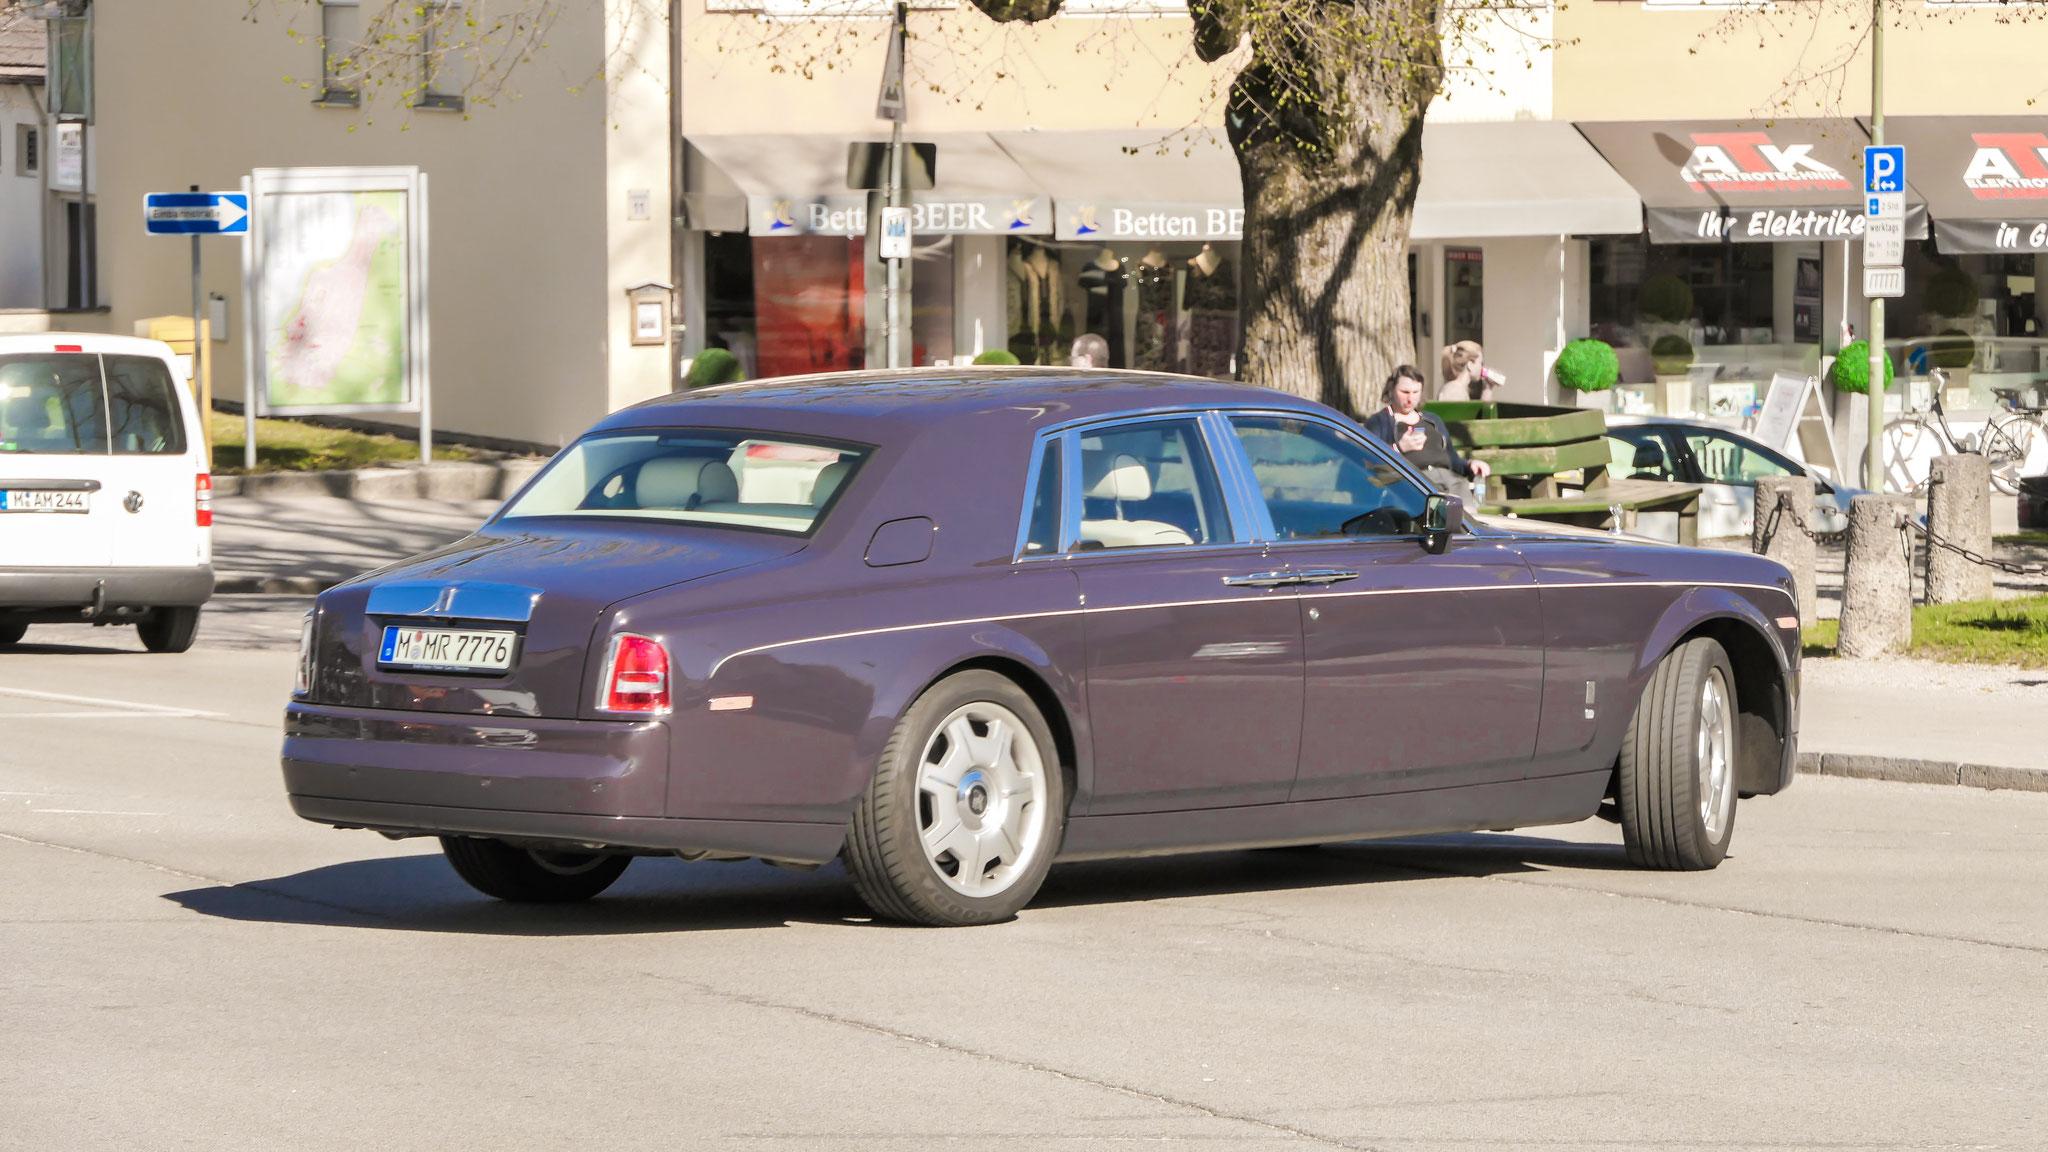 Rolls Royce Phantom - M-MR-7776